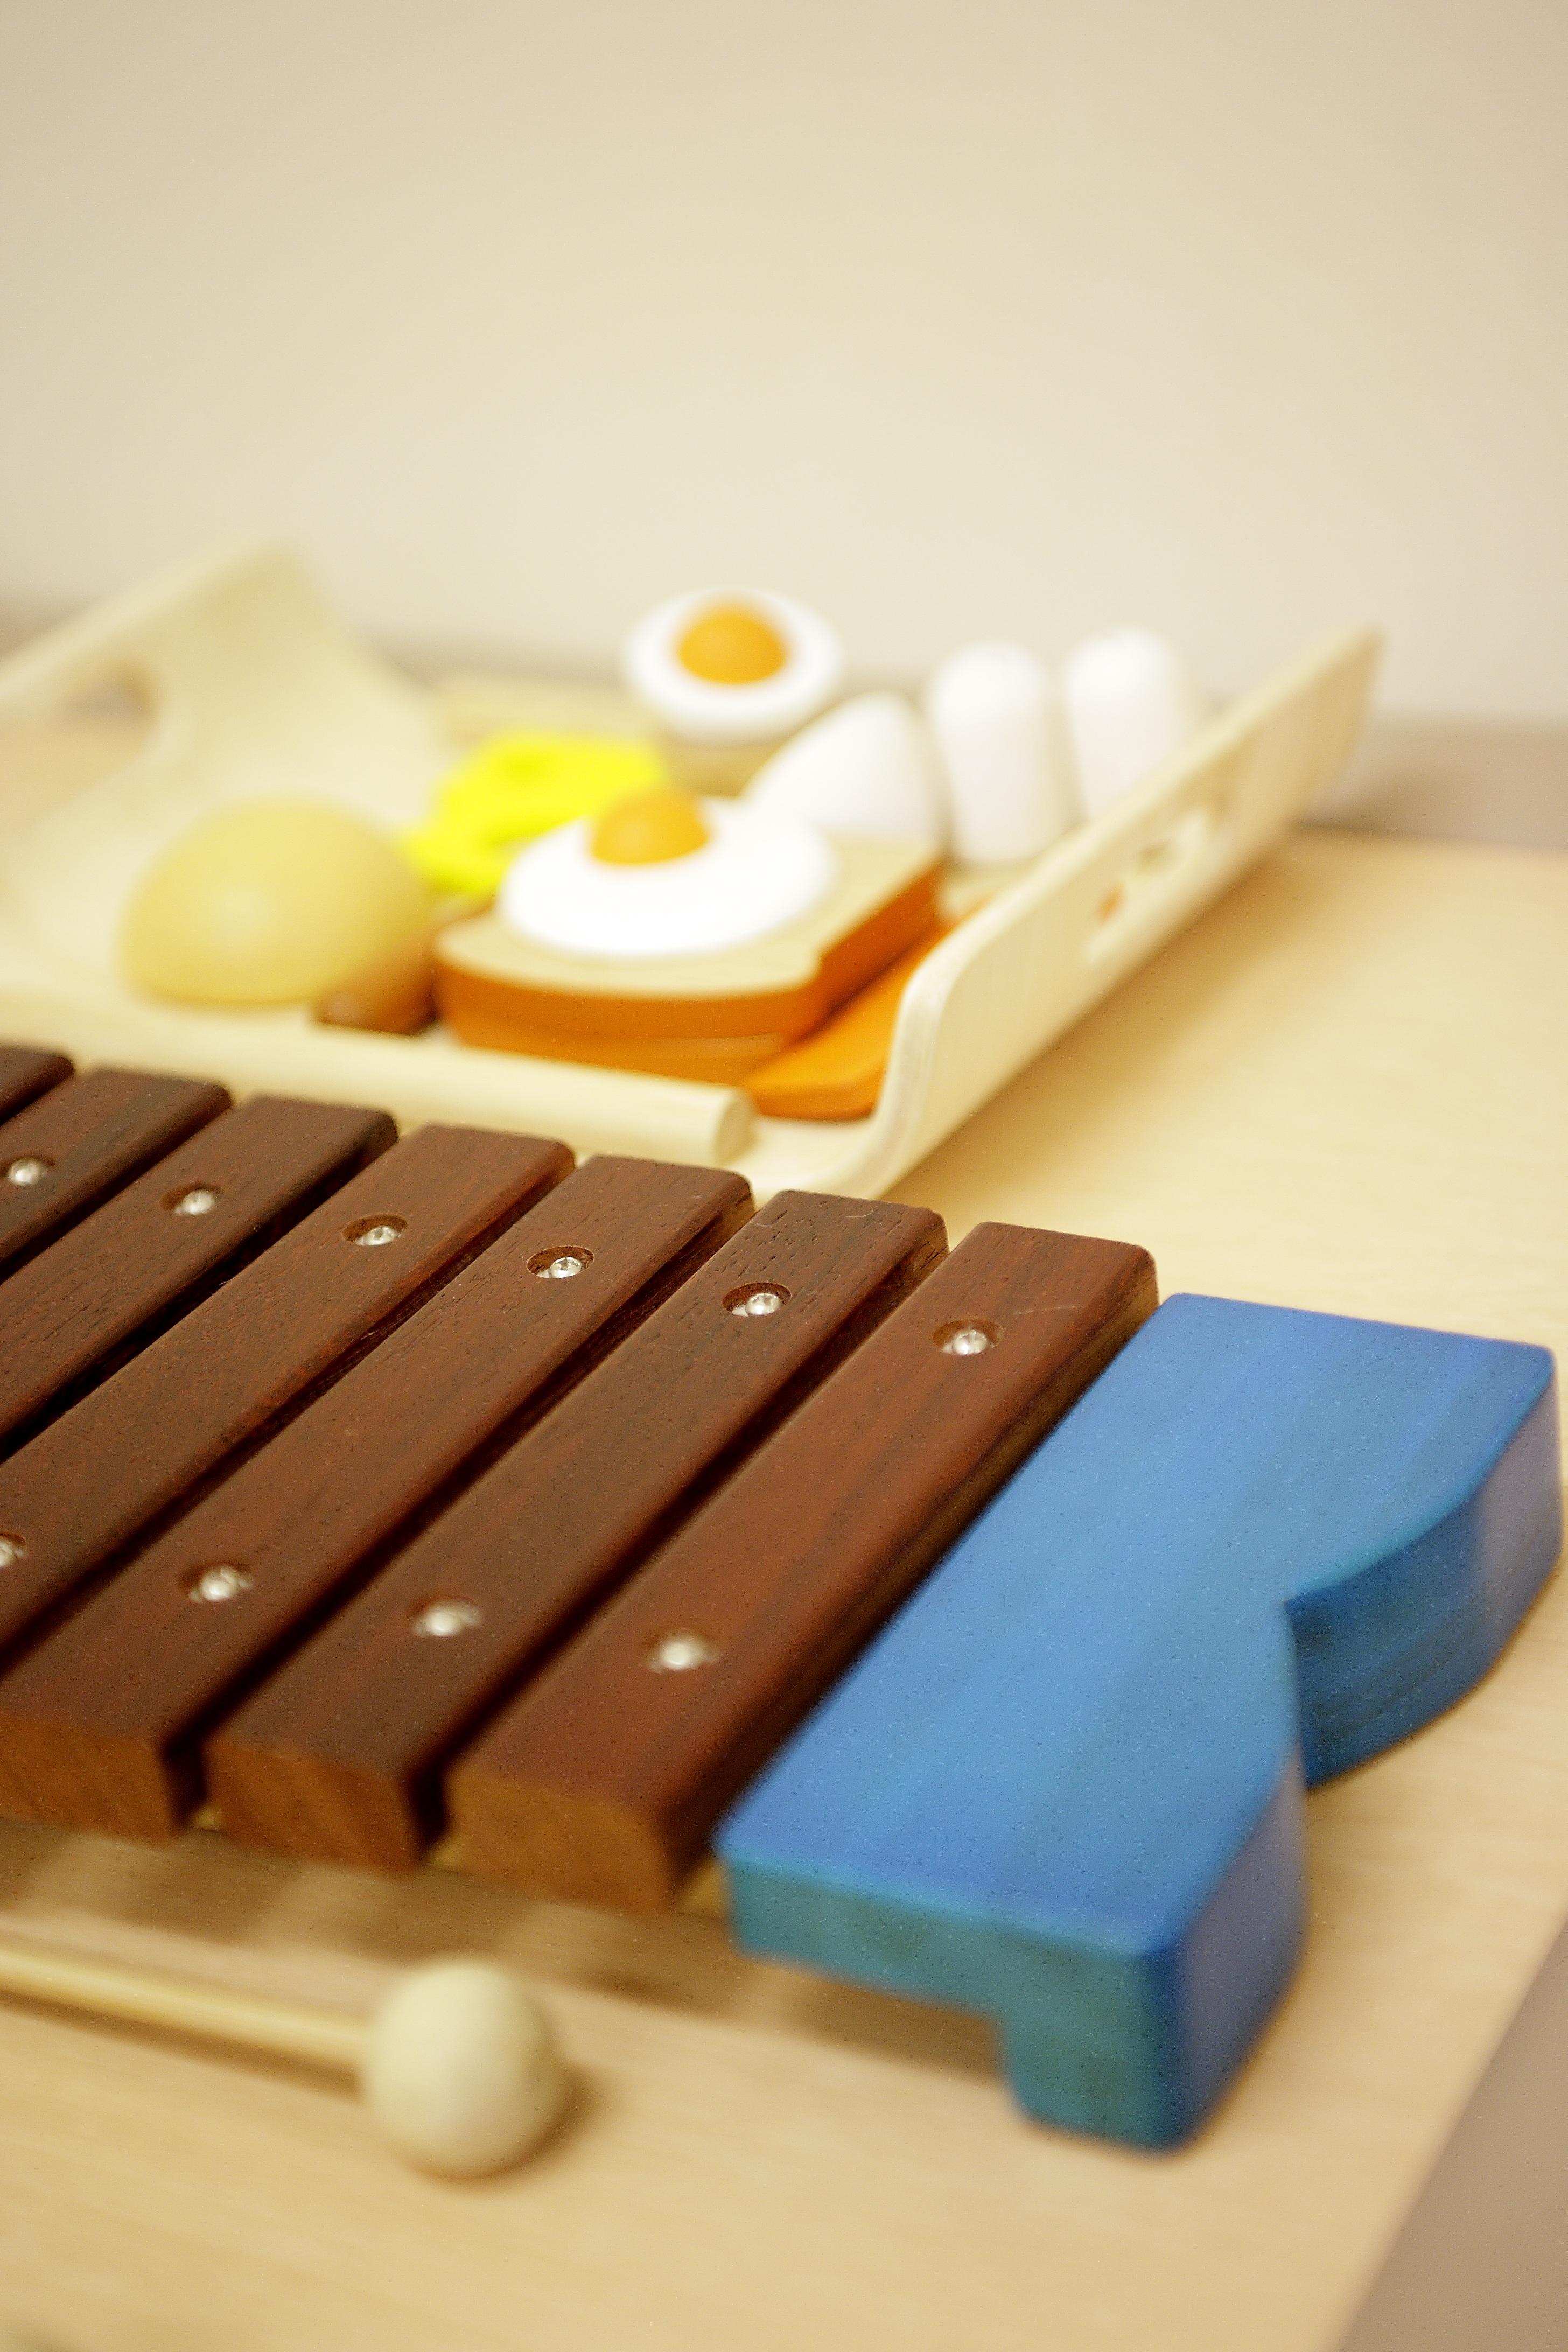 Poze Alimente Coacere Desert Jucărie Instrument